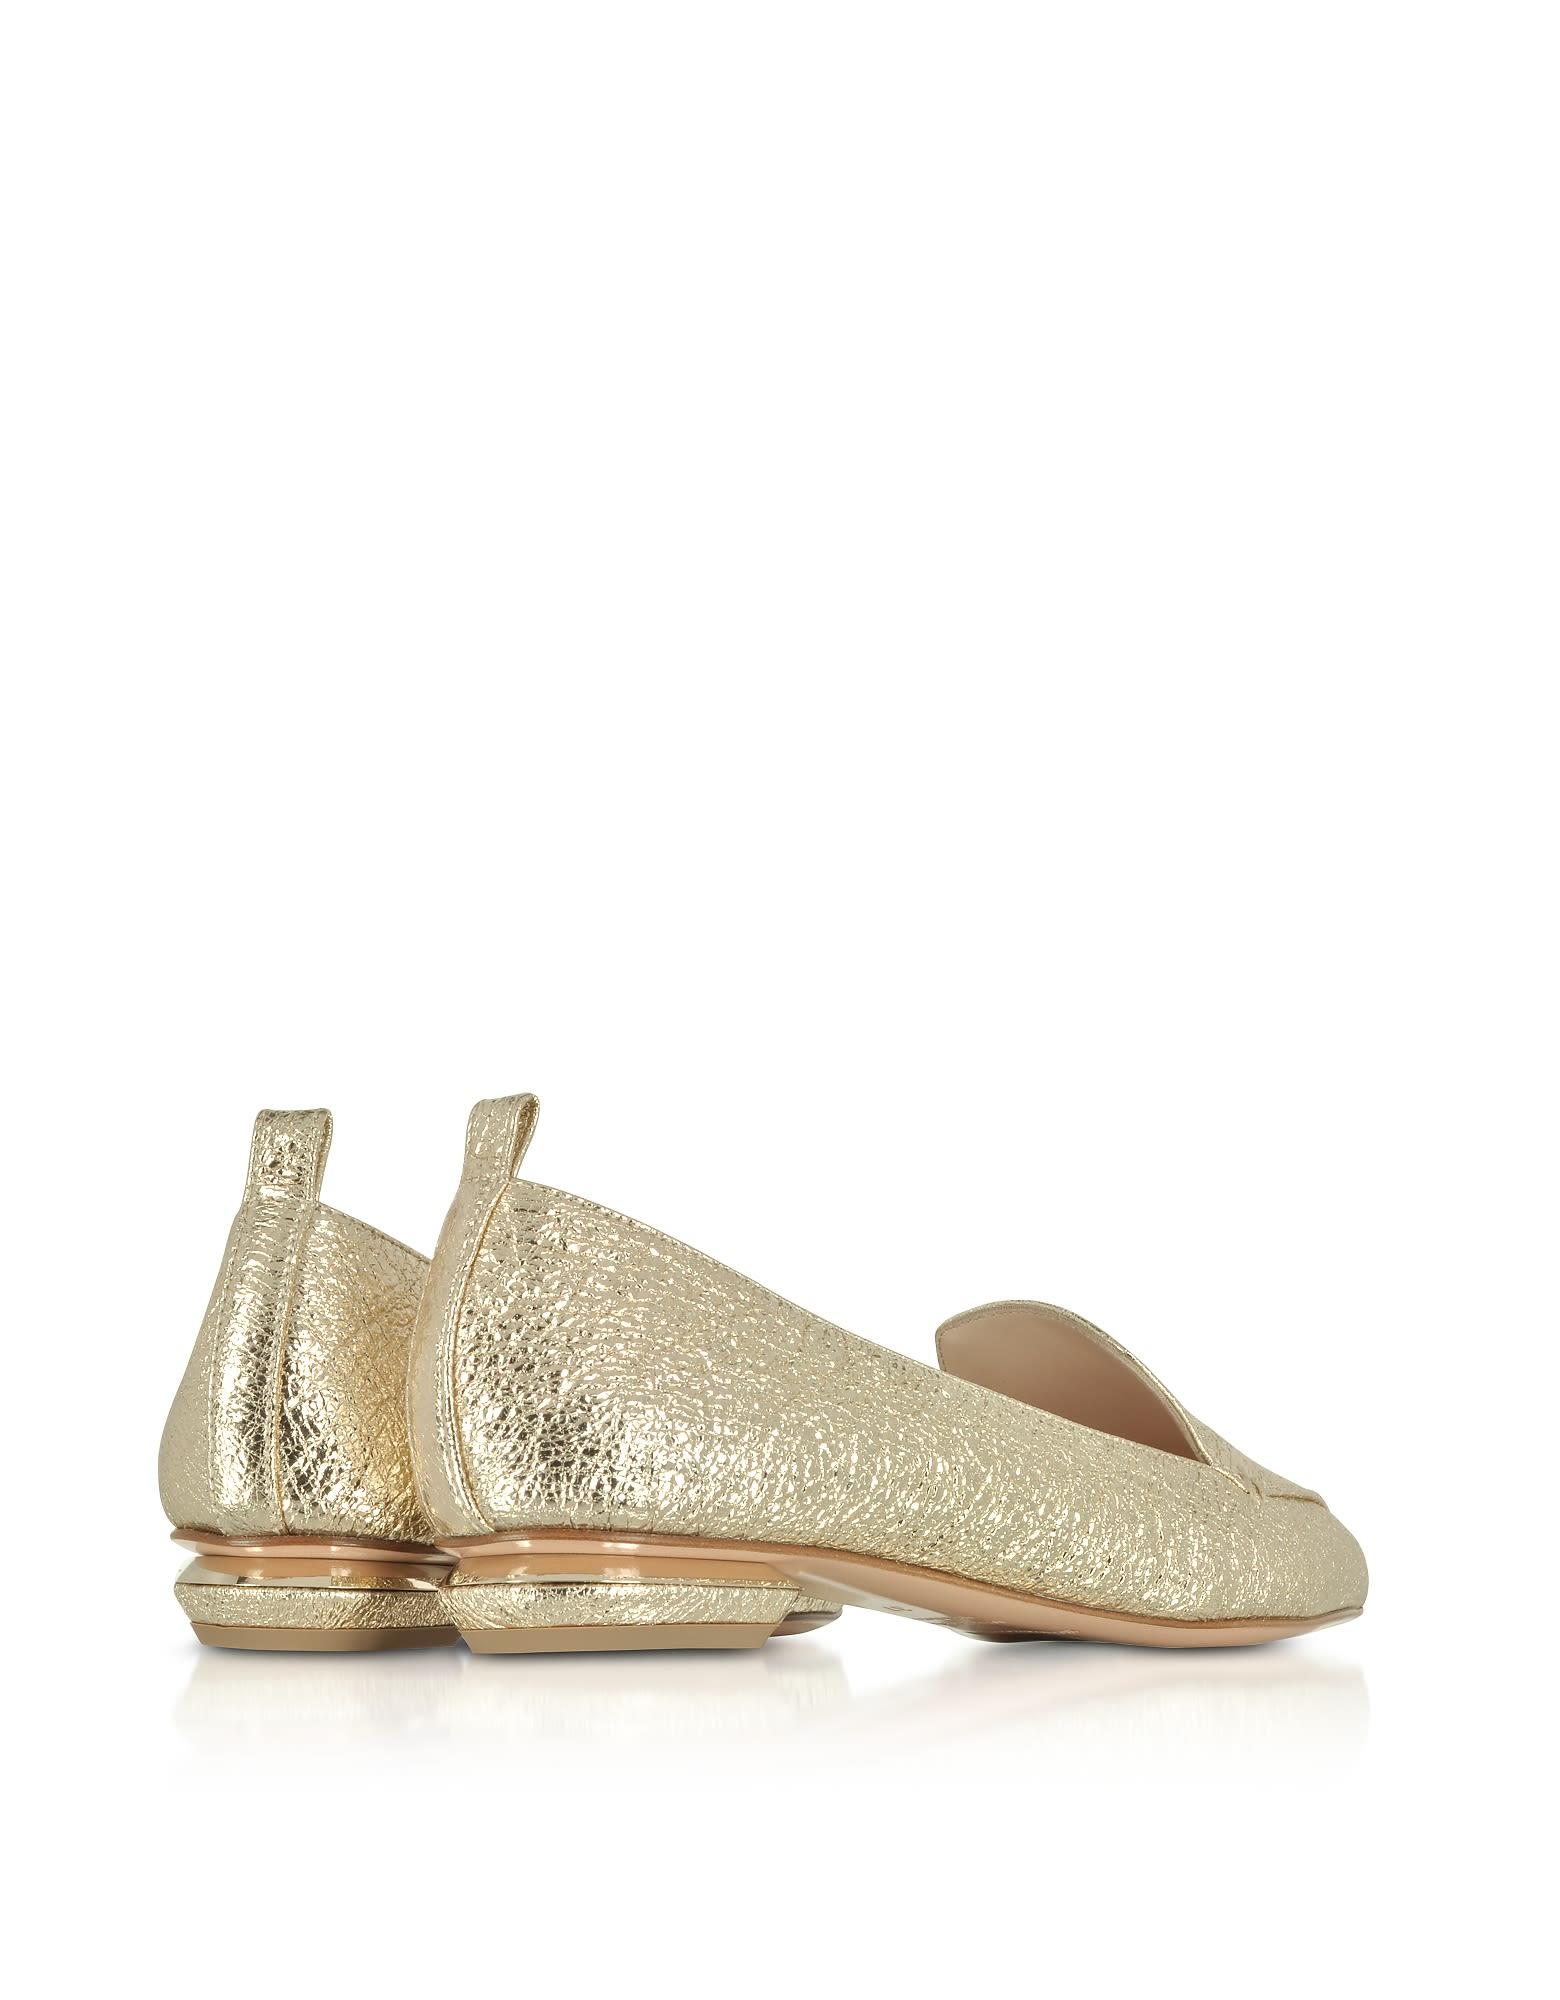 Nicholas Kirkwood Designer Shoes, Platino Crinkly Metallic Leather 18mm Beya Loafers